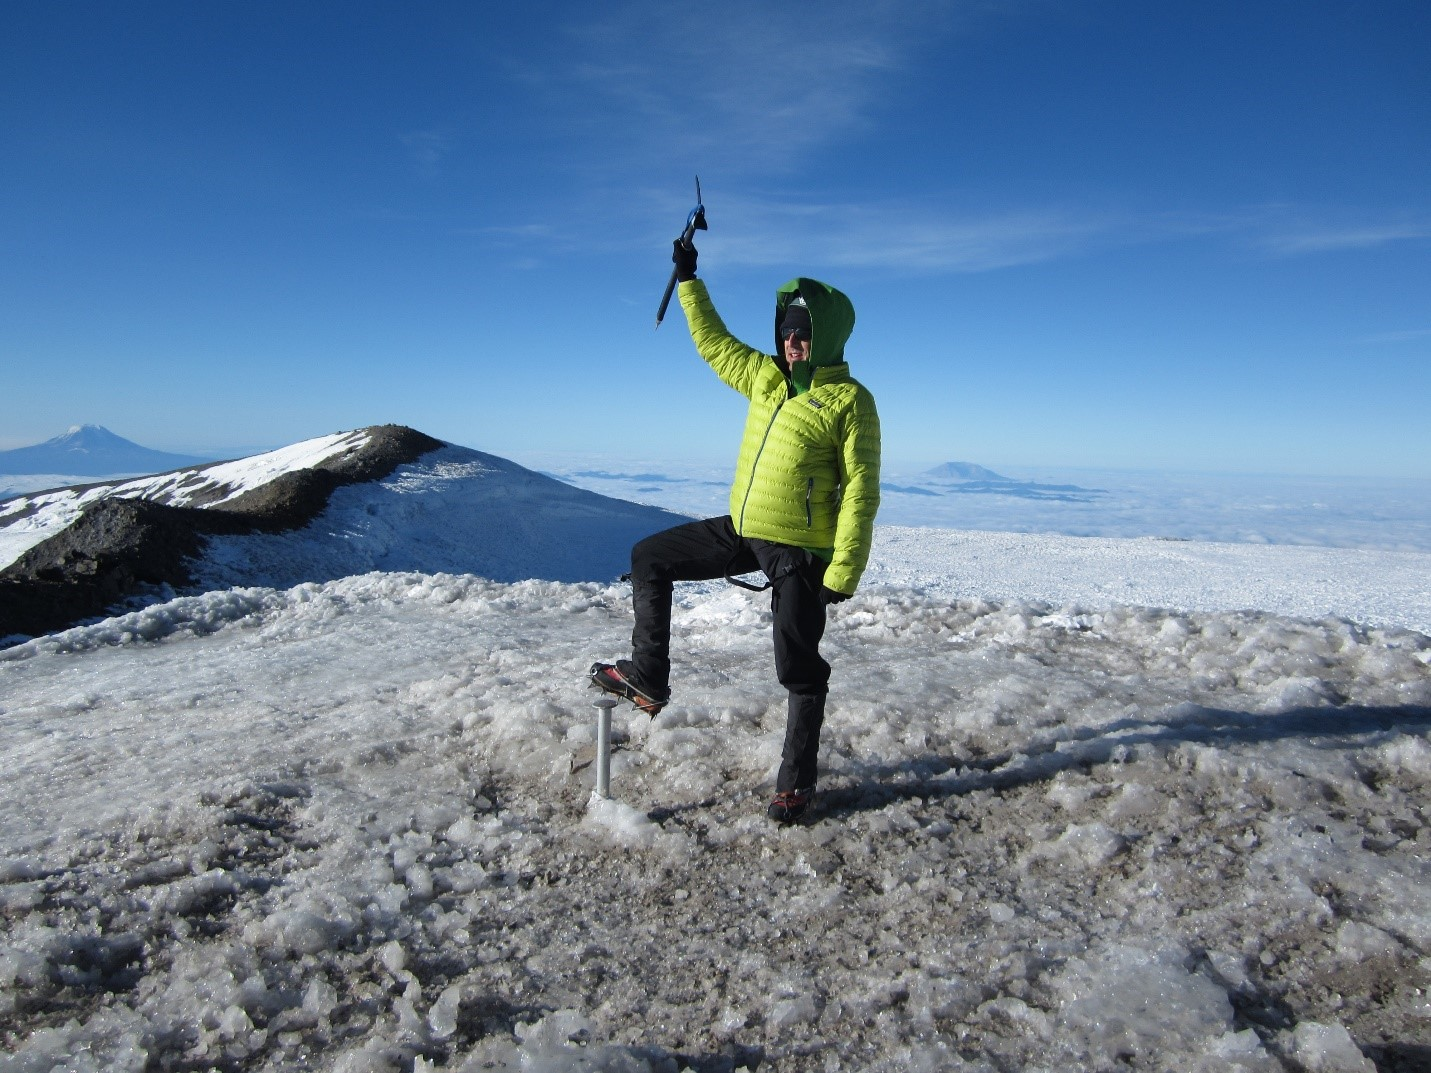 Atop Mount Rainier